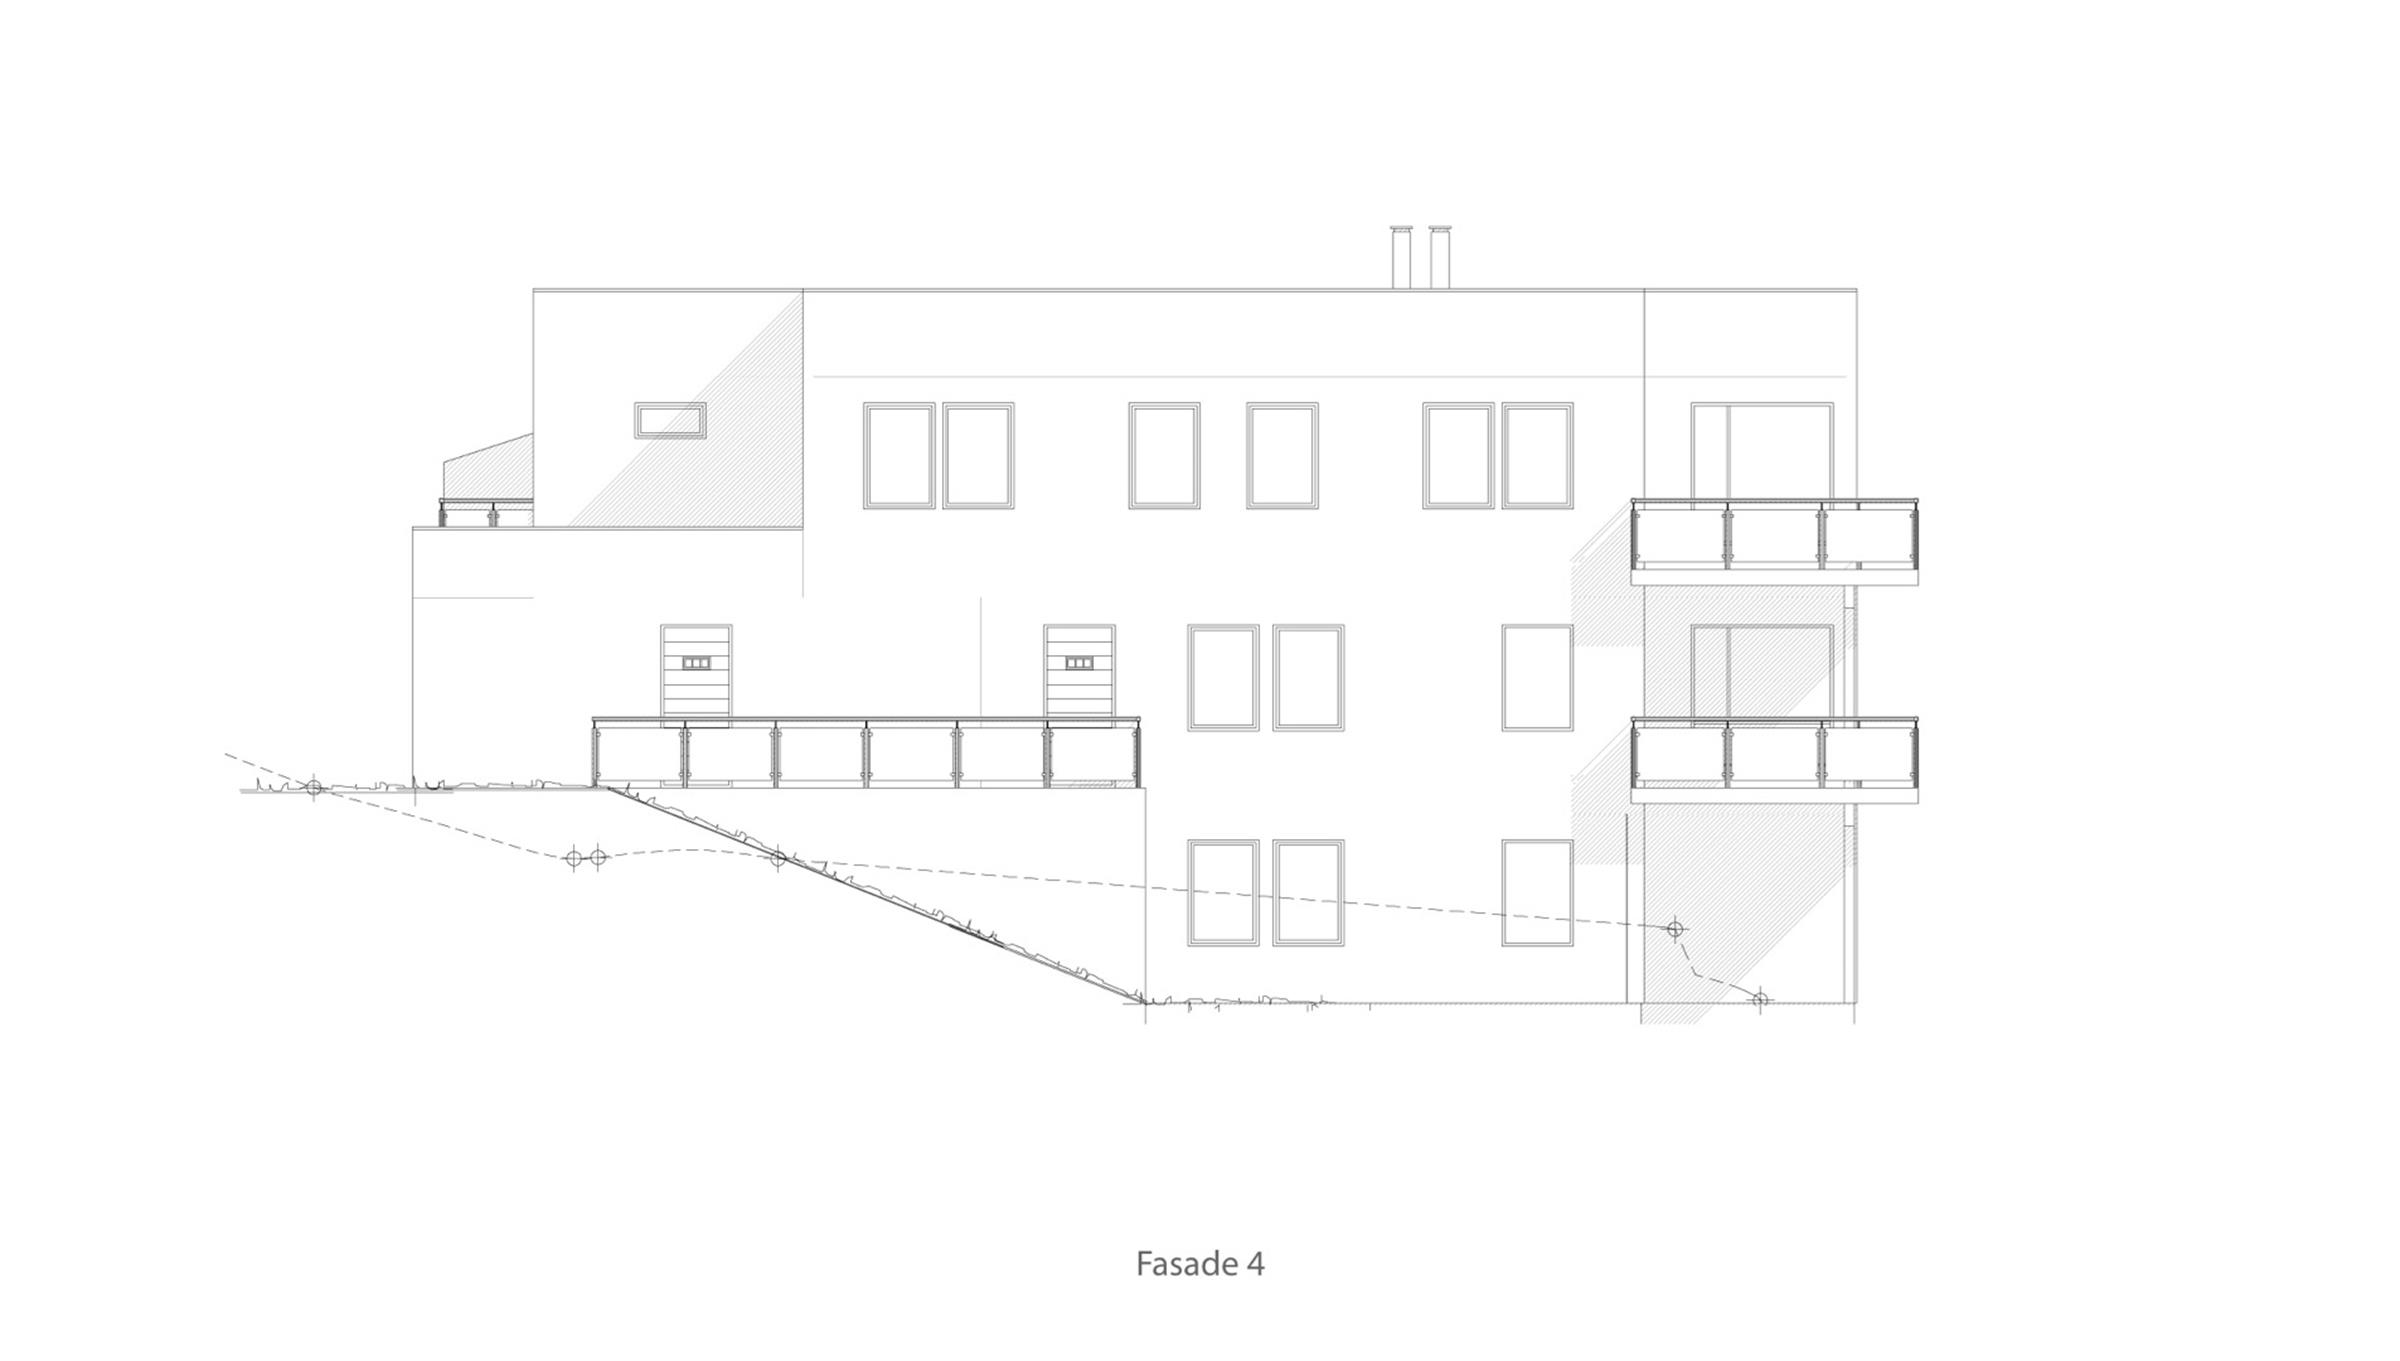 Drammen fasade 4